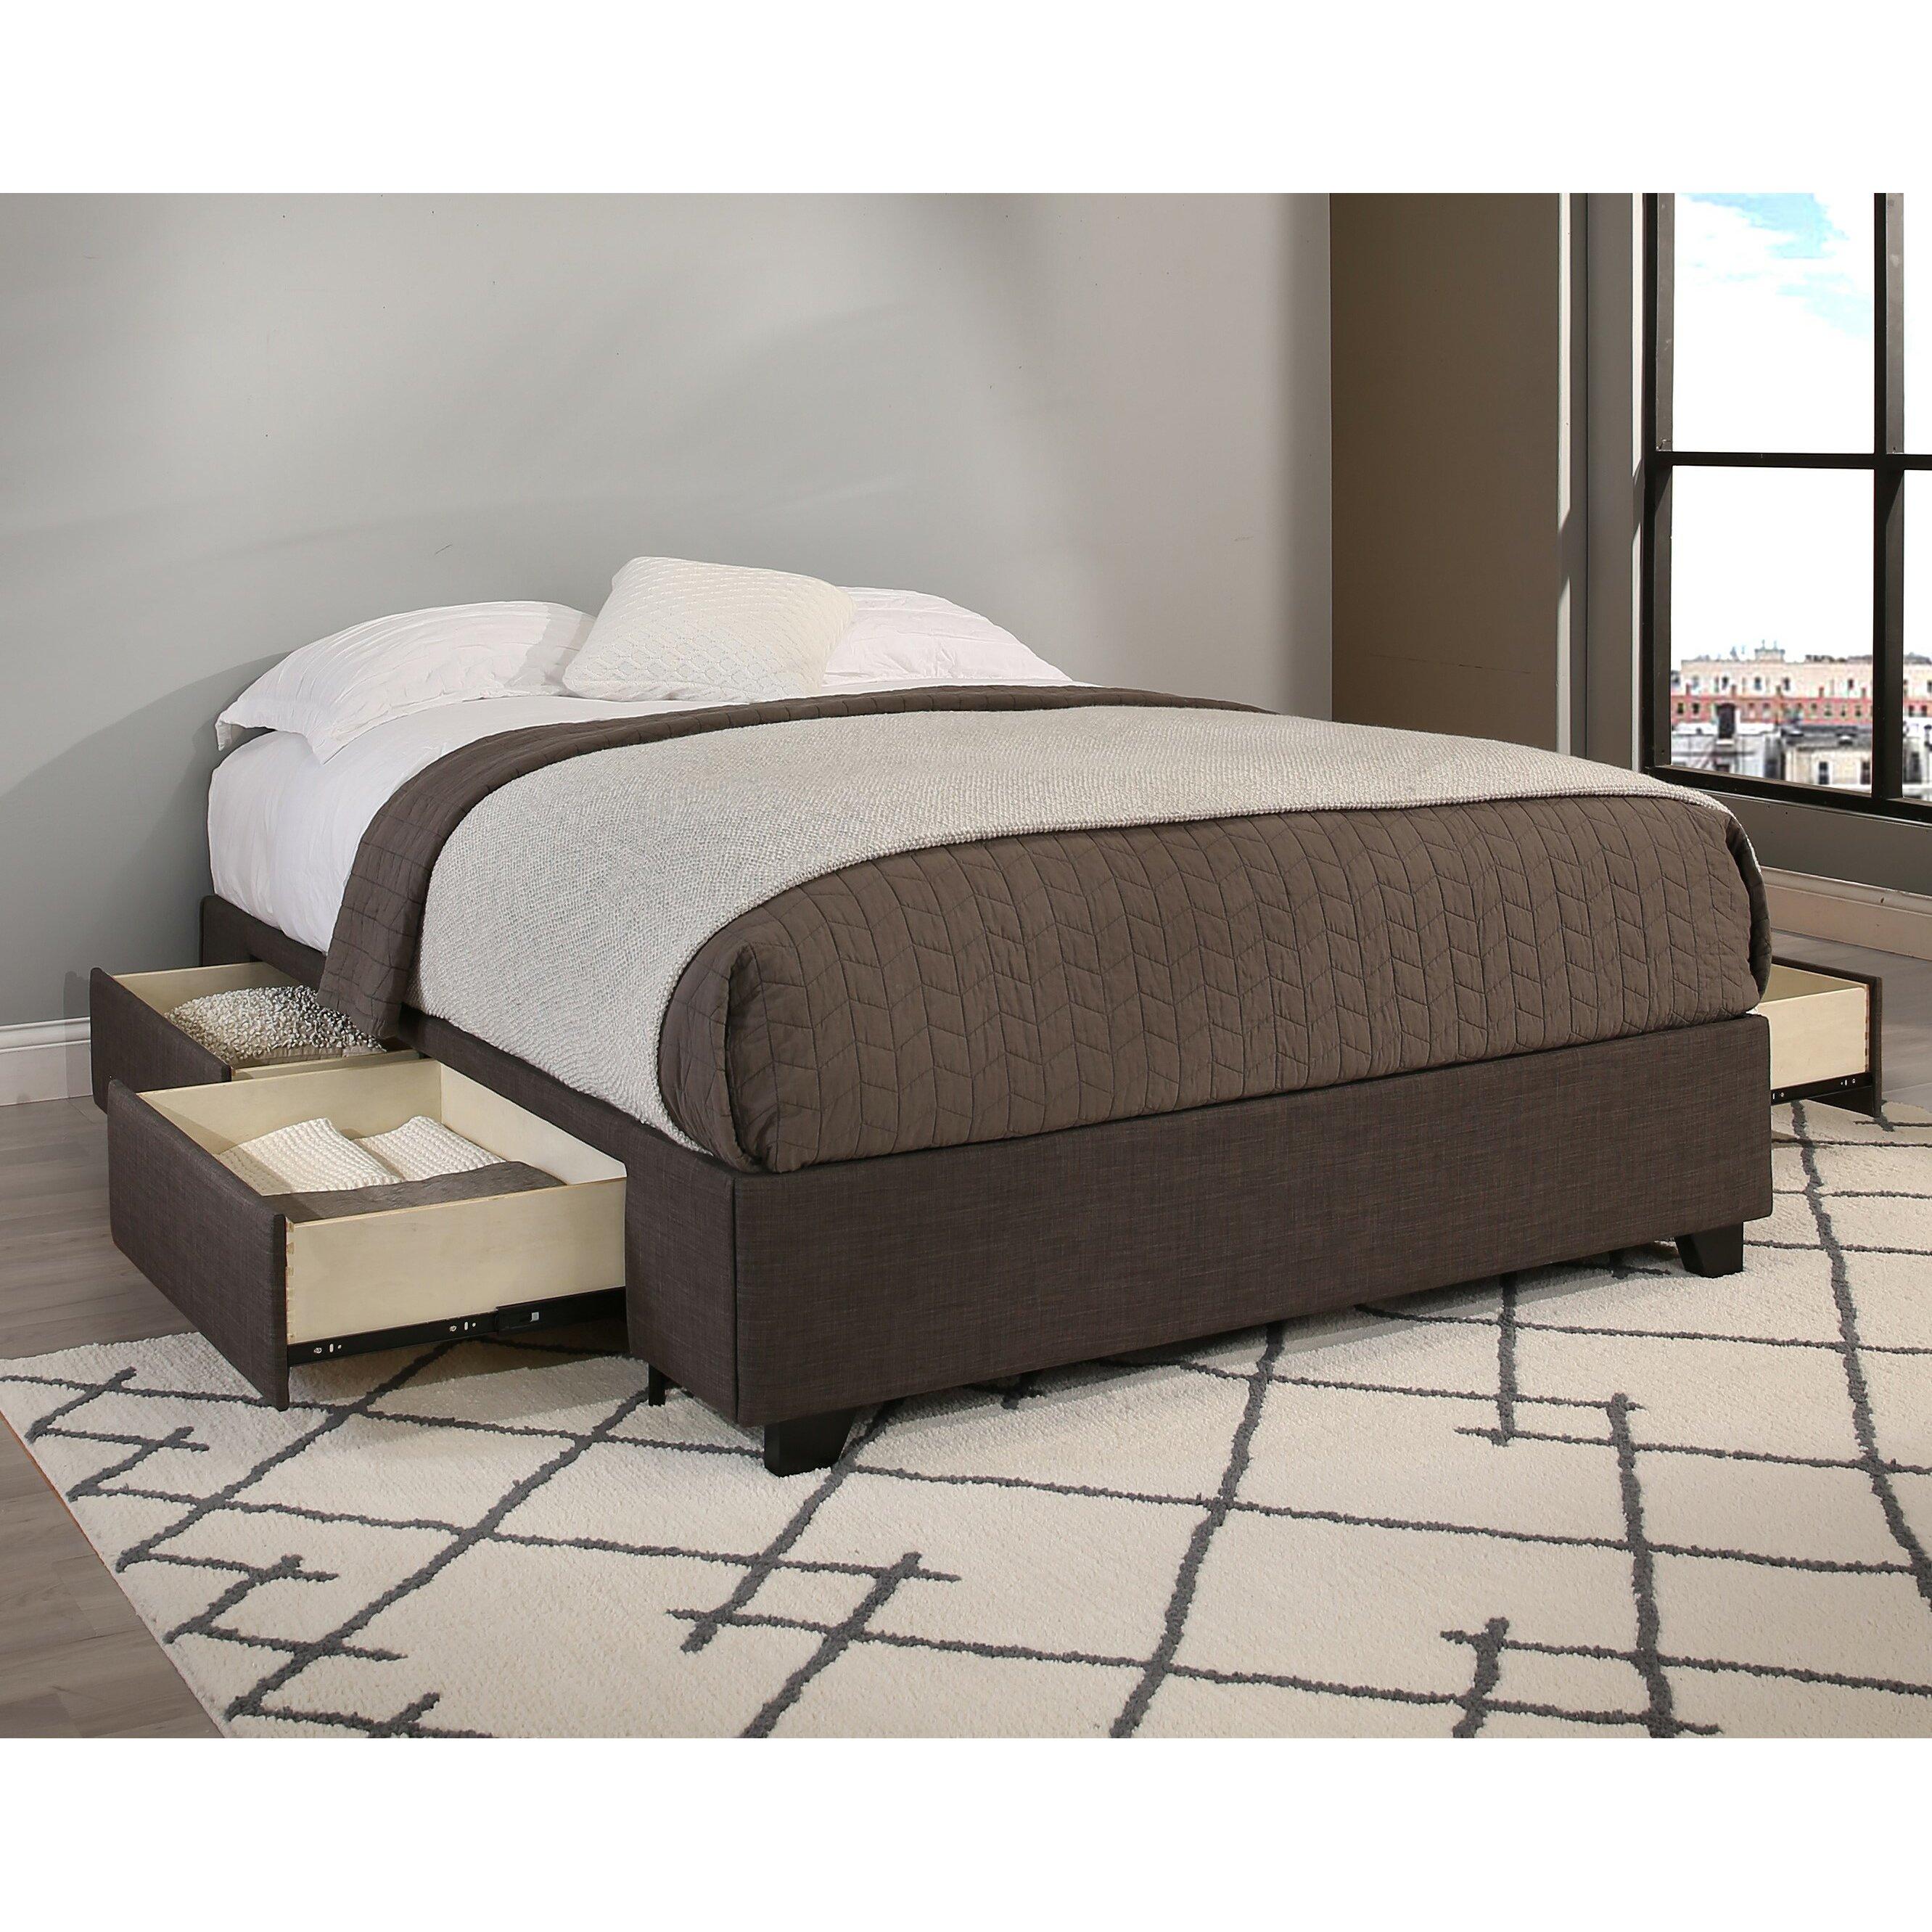 Republicdesignhouse Premium Upholstered Storage Platform